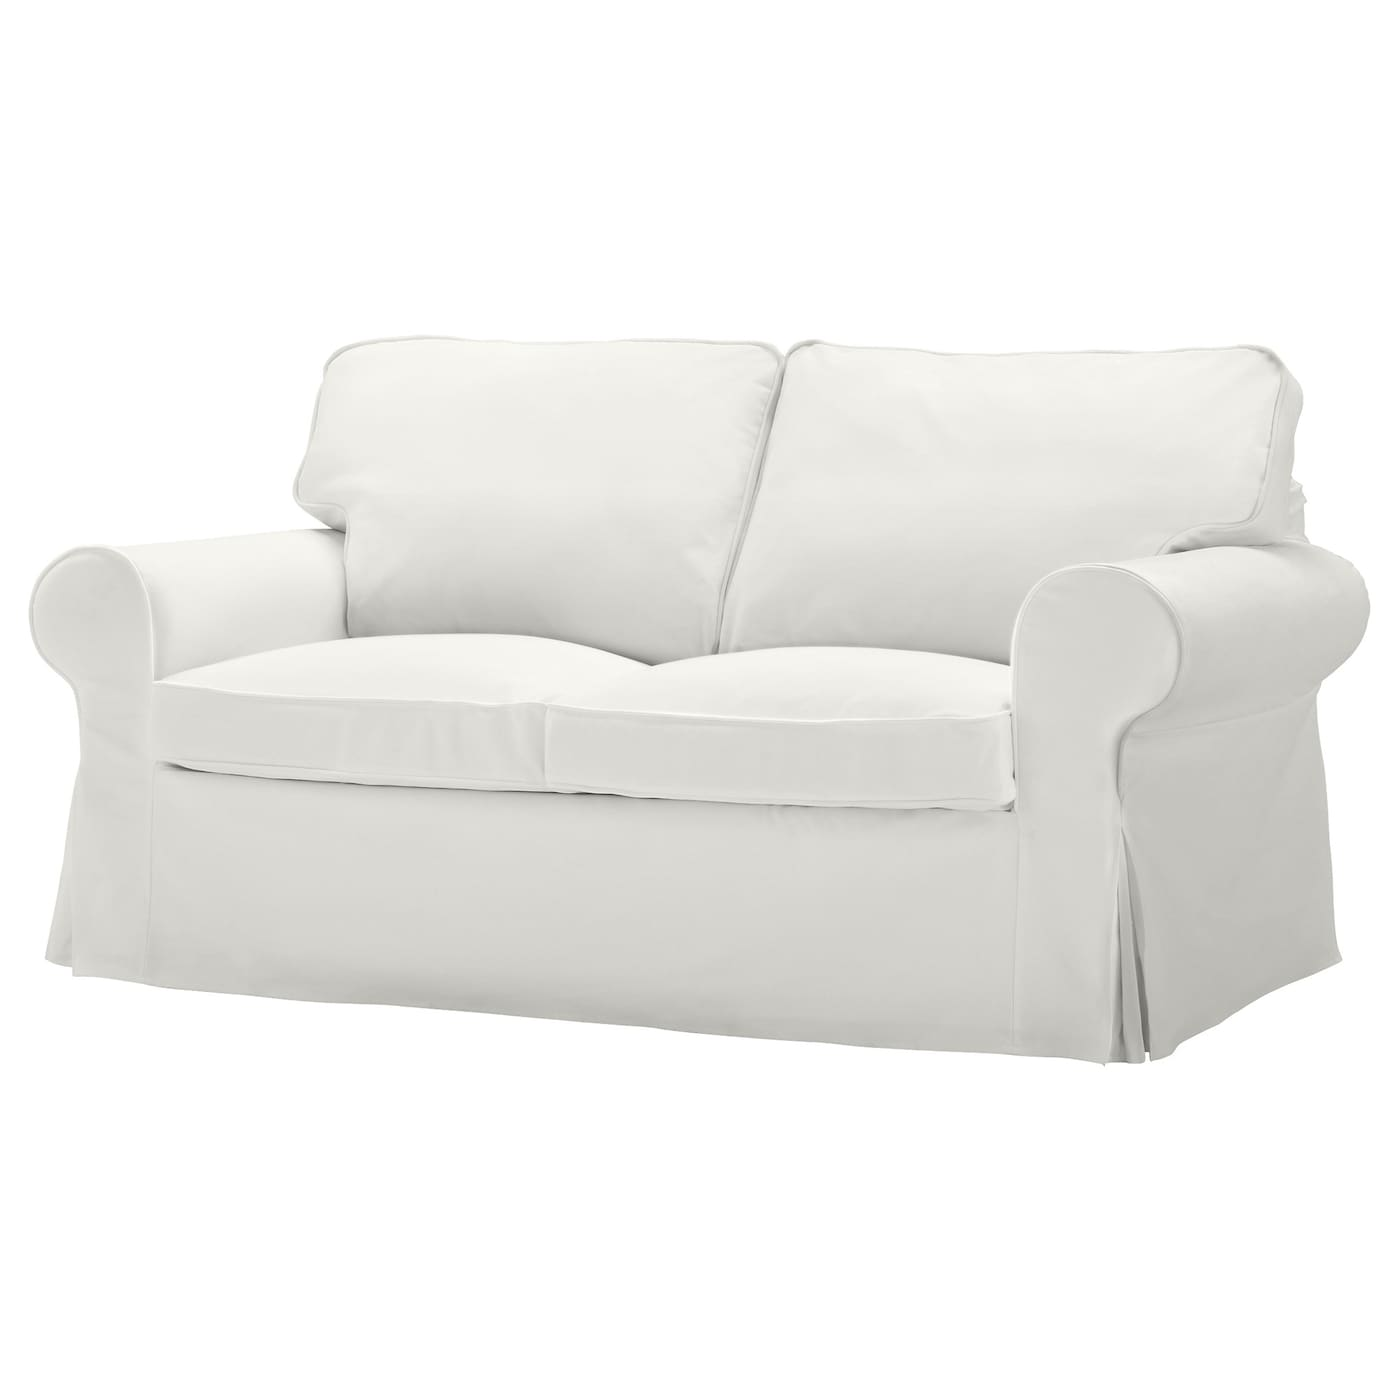 Rp Two Seat Sofa Blekinge White